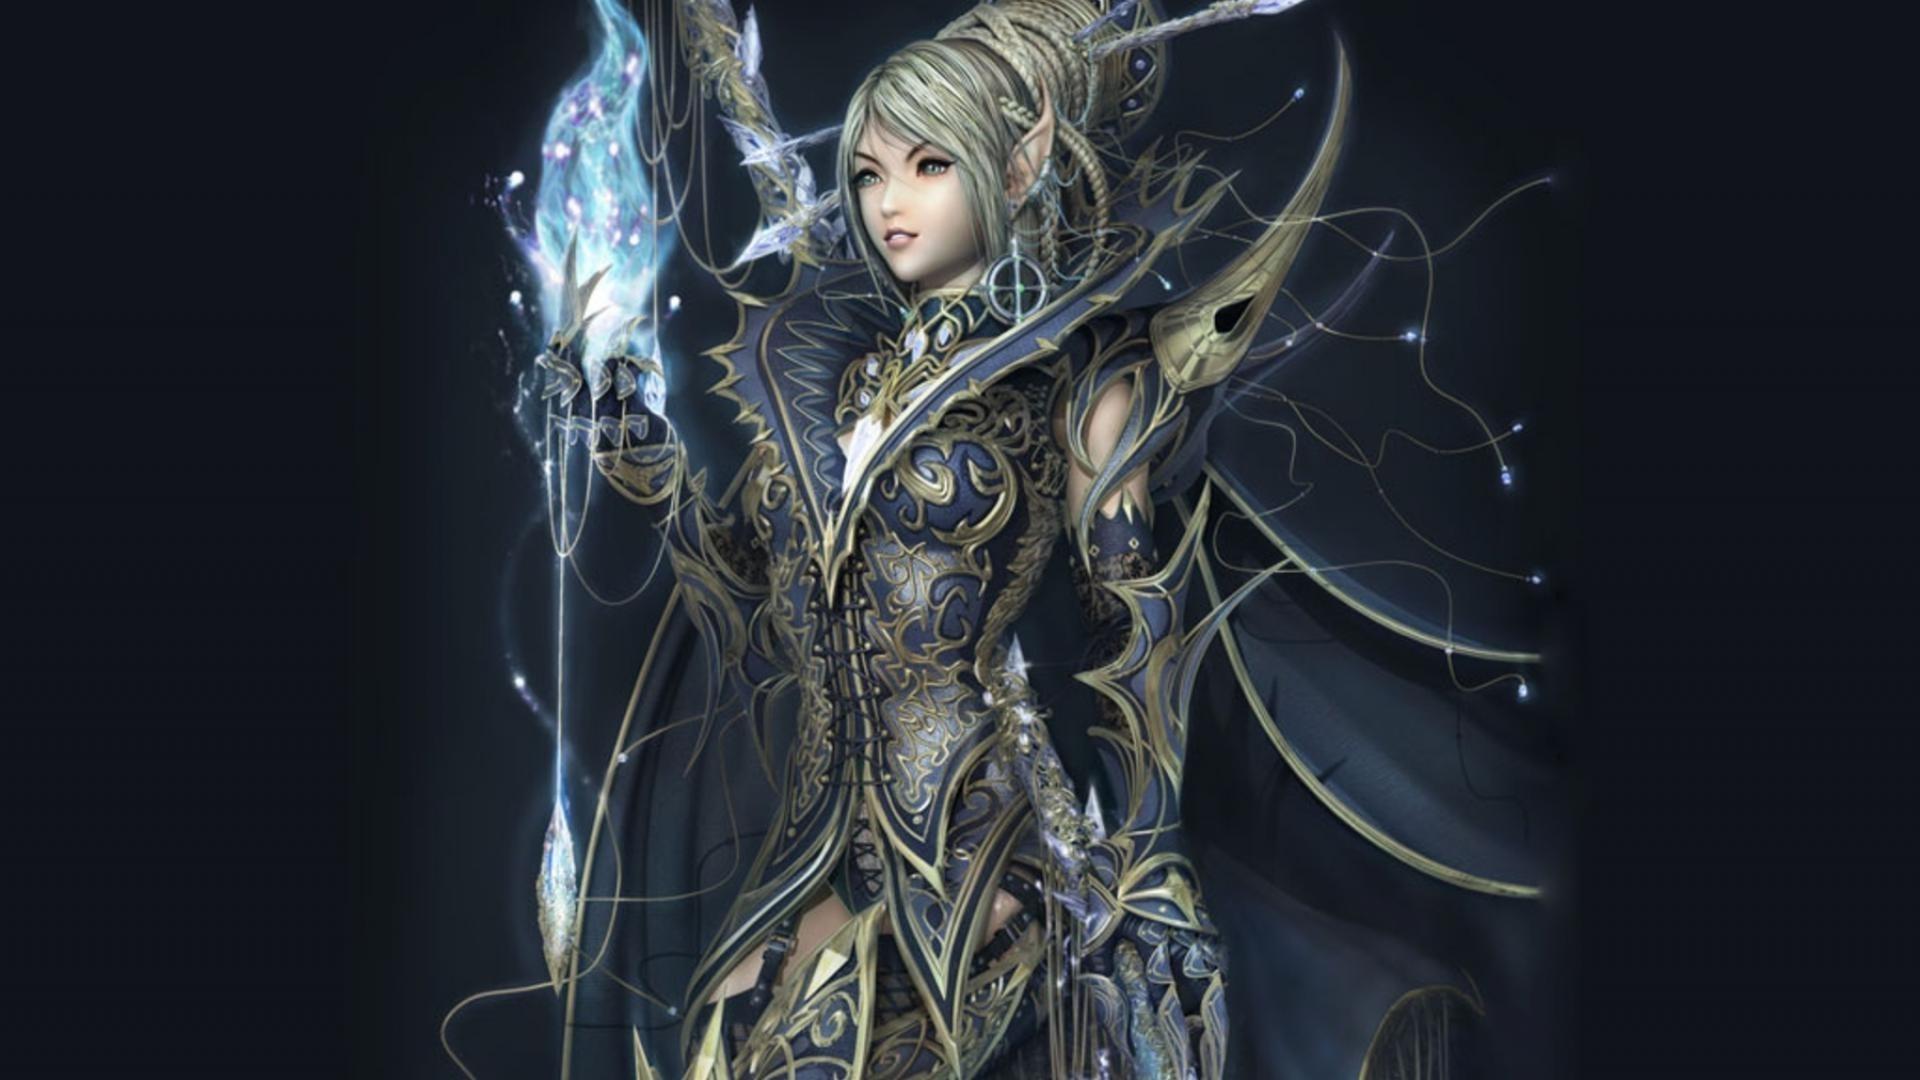 Filename: elf-warrior-5327.jpg